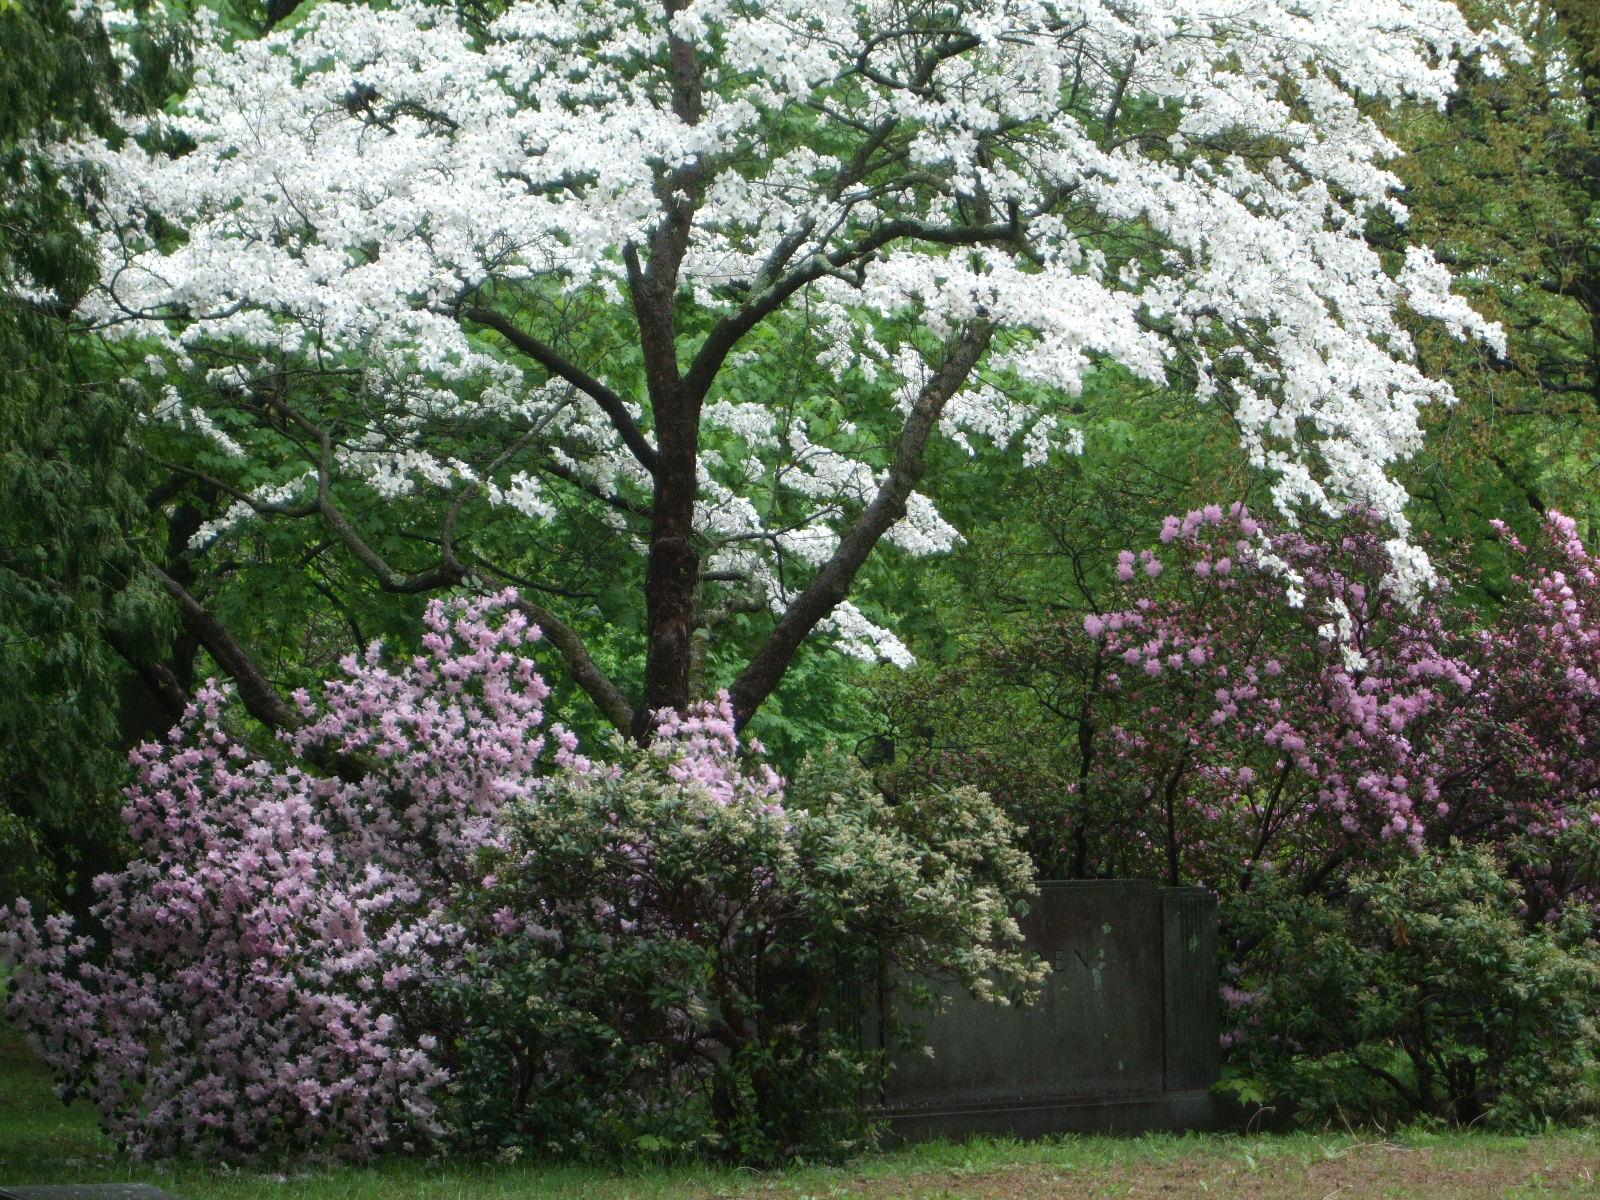 Seeing New England: FLOWERING TREES